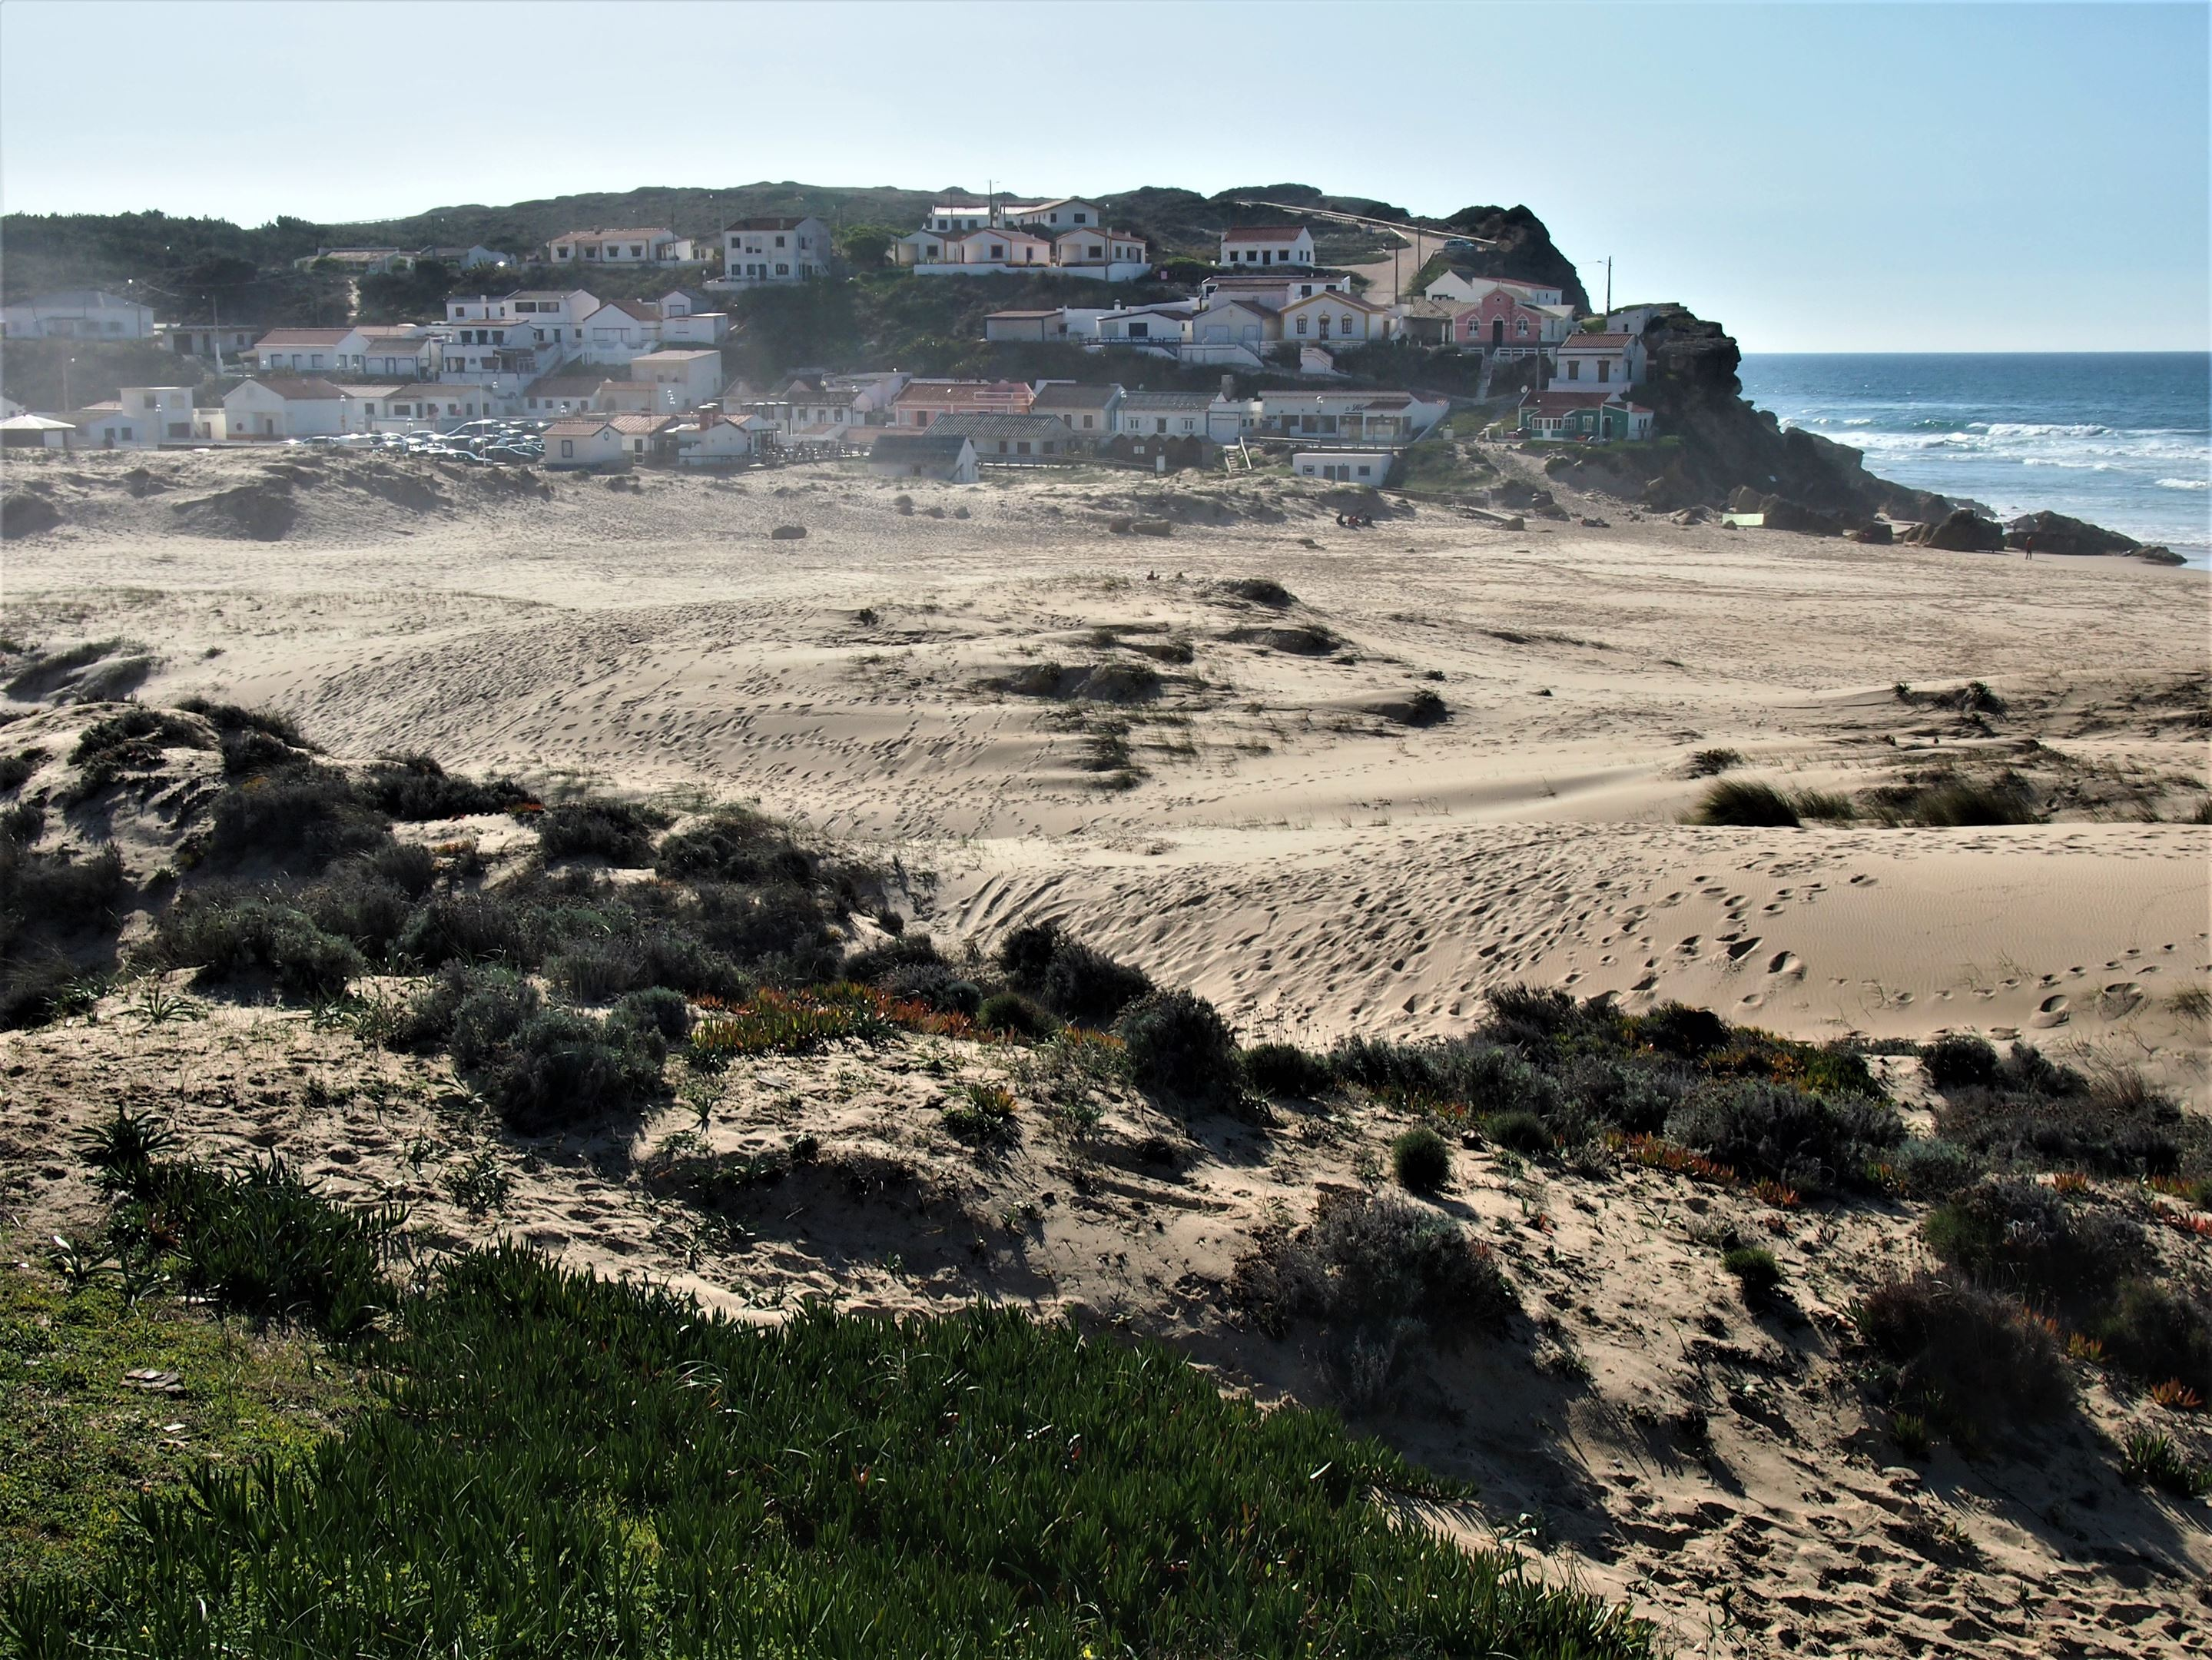 Praia do Monte Clérigo, with the small village in the background, Aljezur region